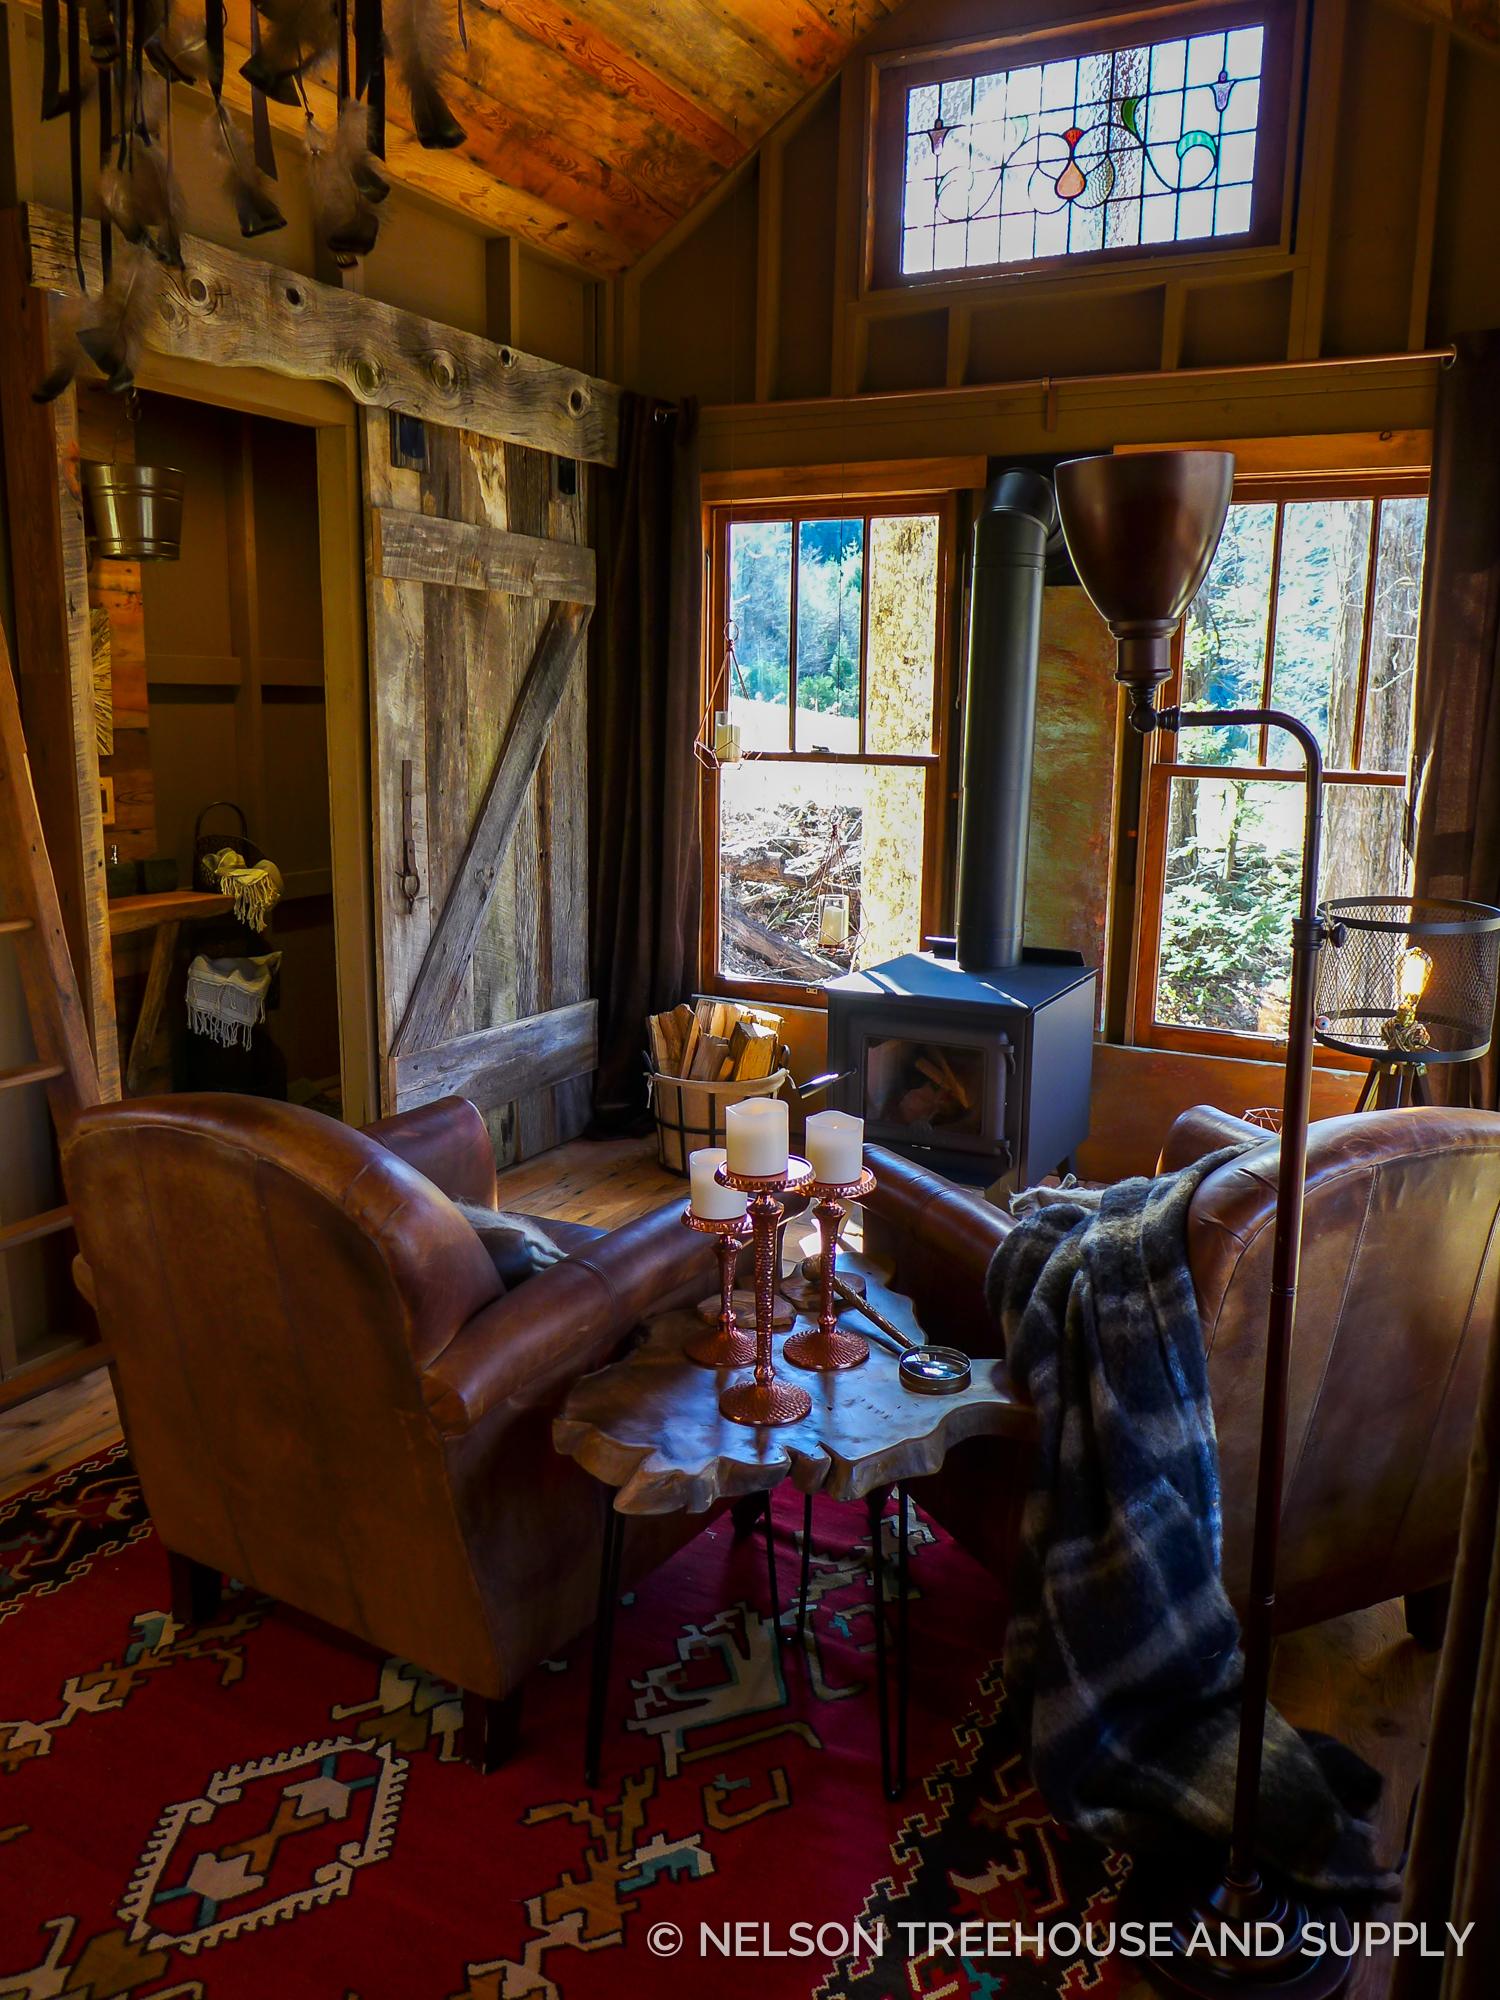 Blue Ridge Mountain Meditative Nelson Treehouse